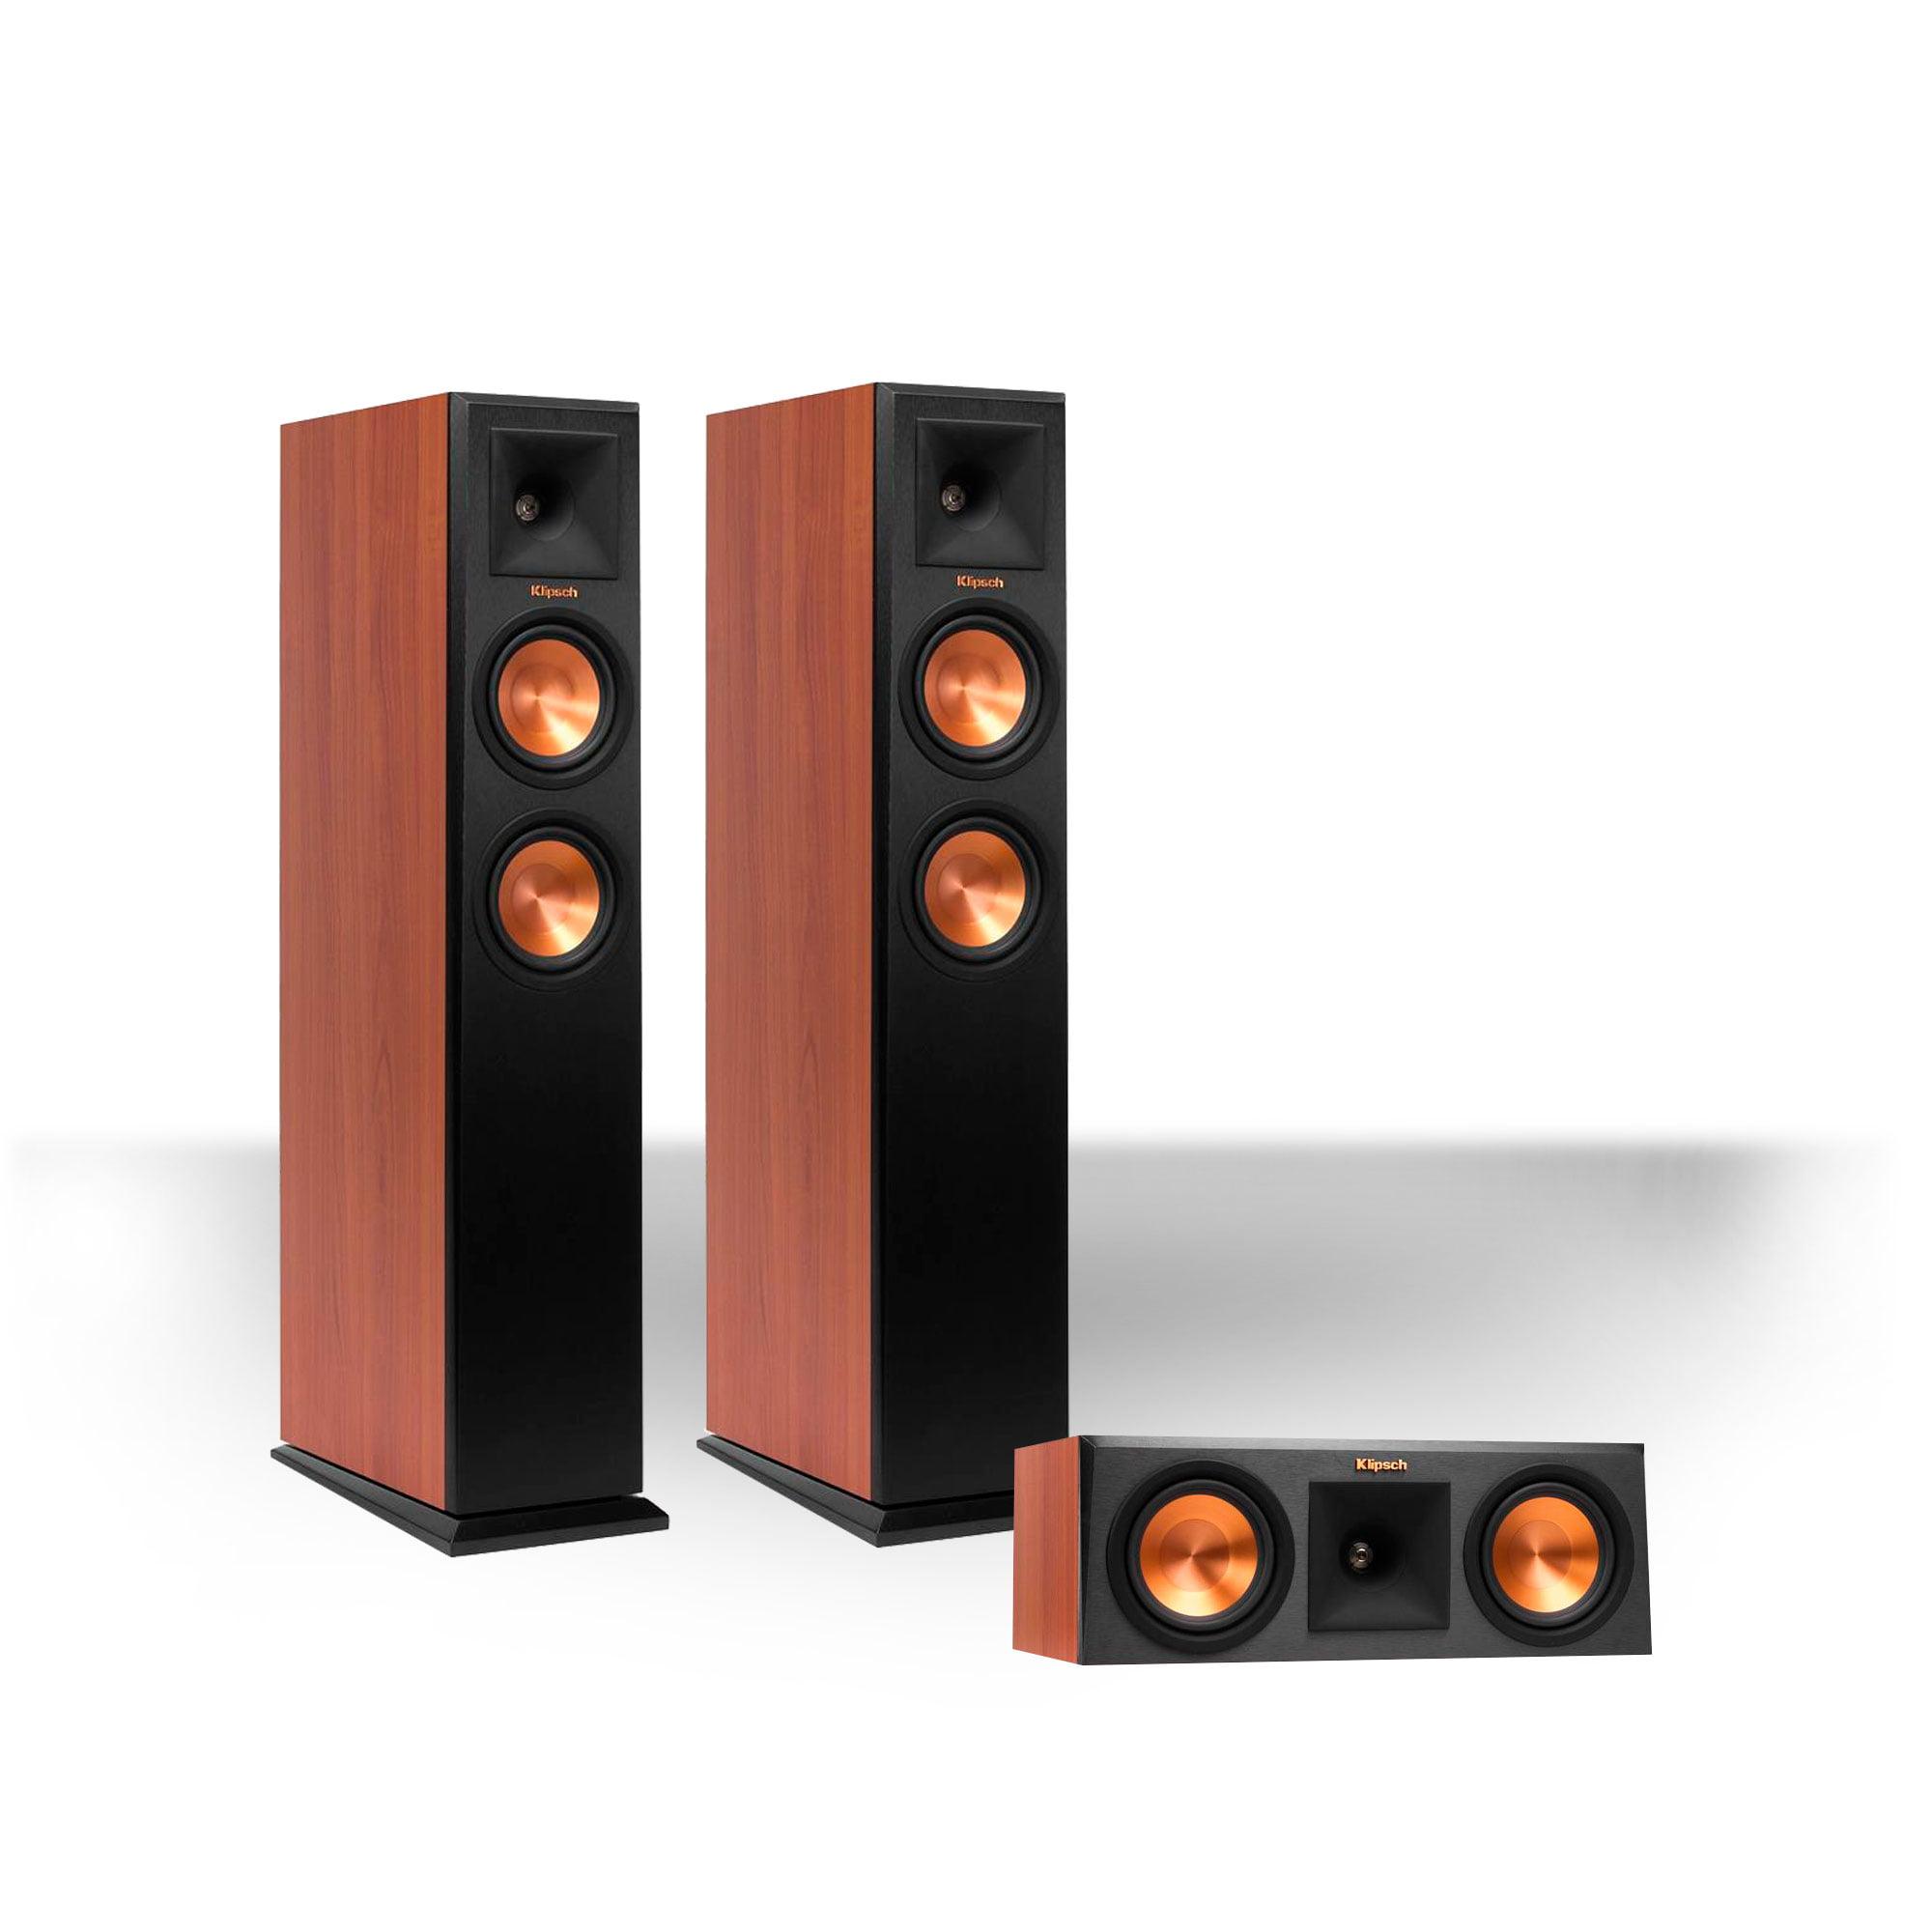 Klipsch Rp 250f Reference Premiere Floorstanding Speaker